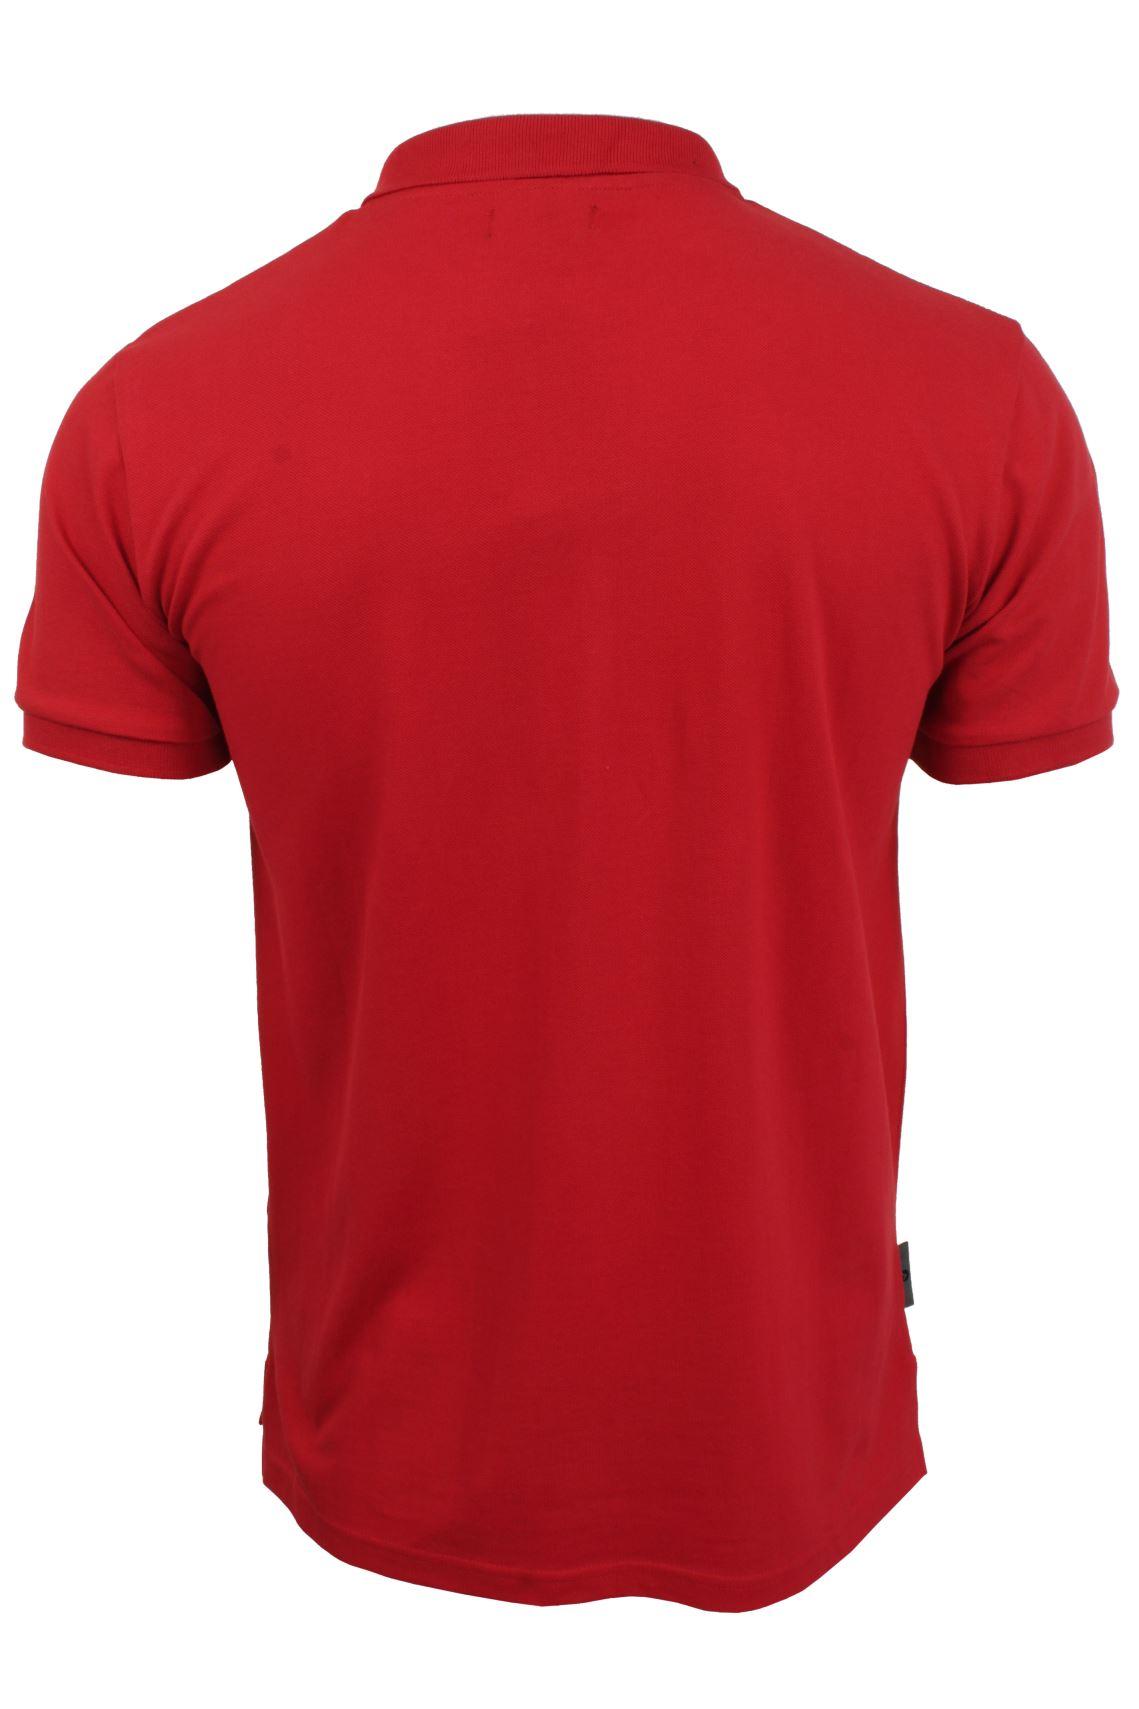 Voi-Jeans-Mens-Fashion-Polo-Shirt-Redford-Short-Sleeved thumbnail 8